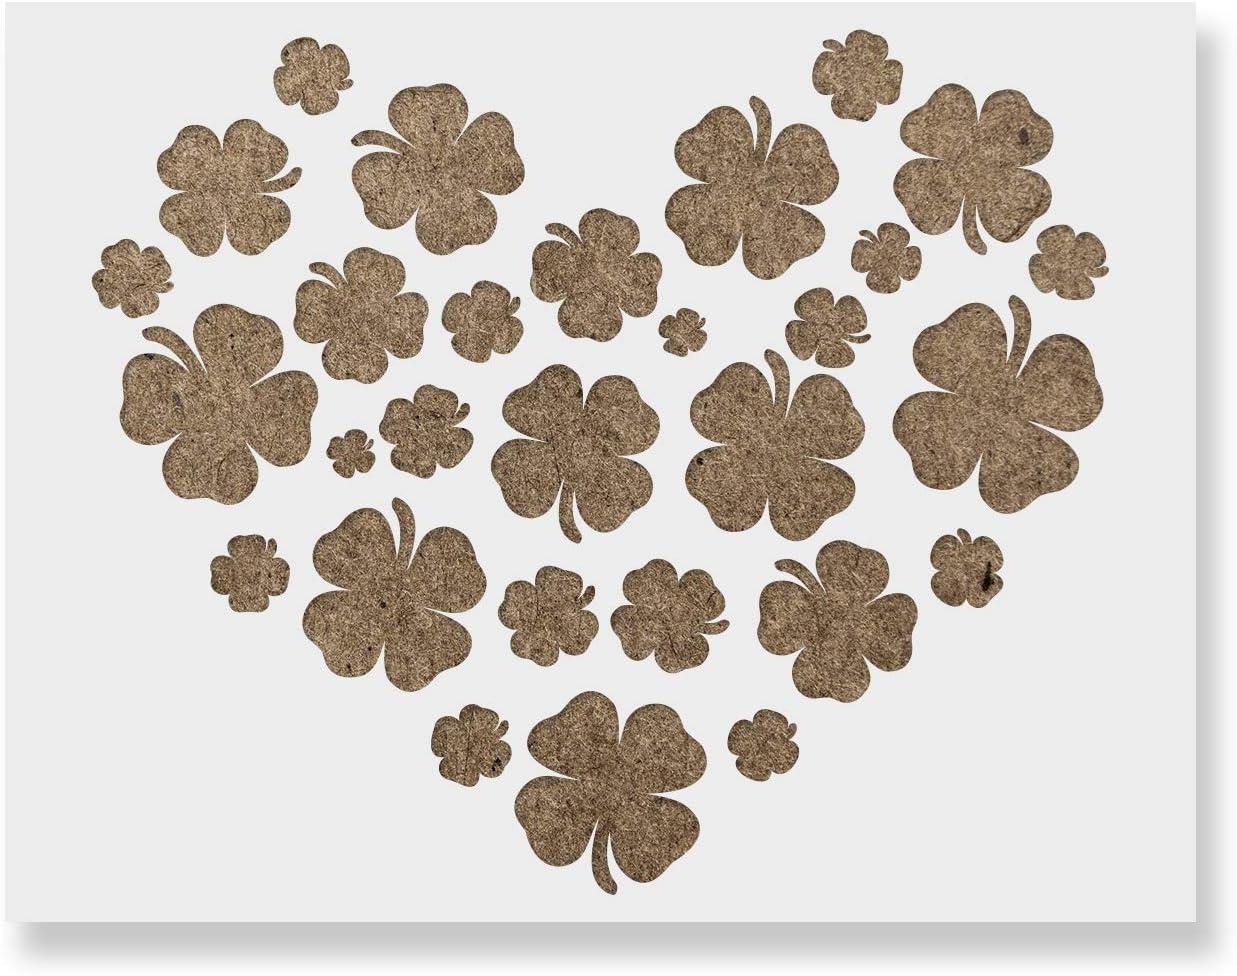 Heart Shamrocks Quality inspection Stencil Regular dealer - Reusable for Painting Creat Stencils